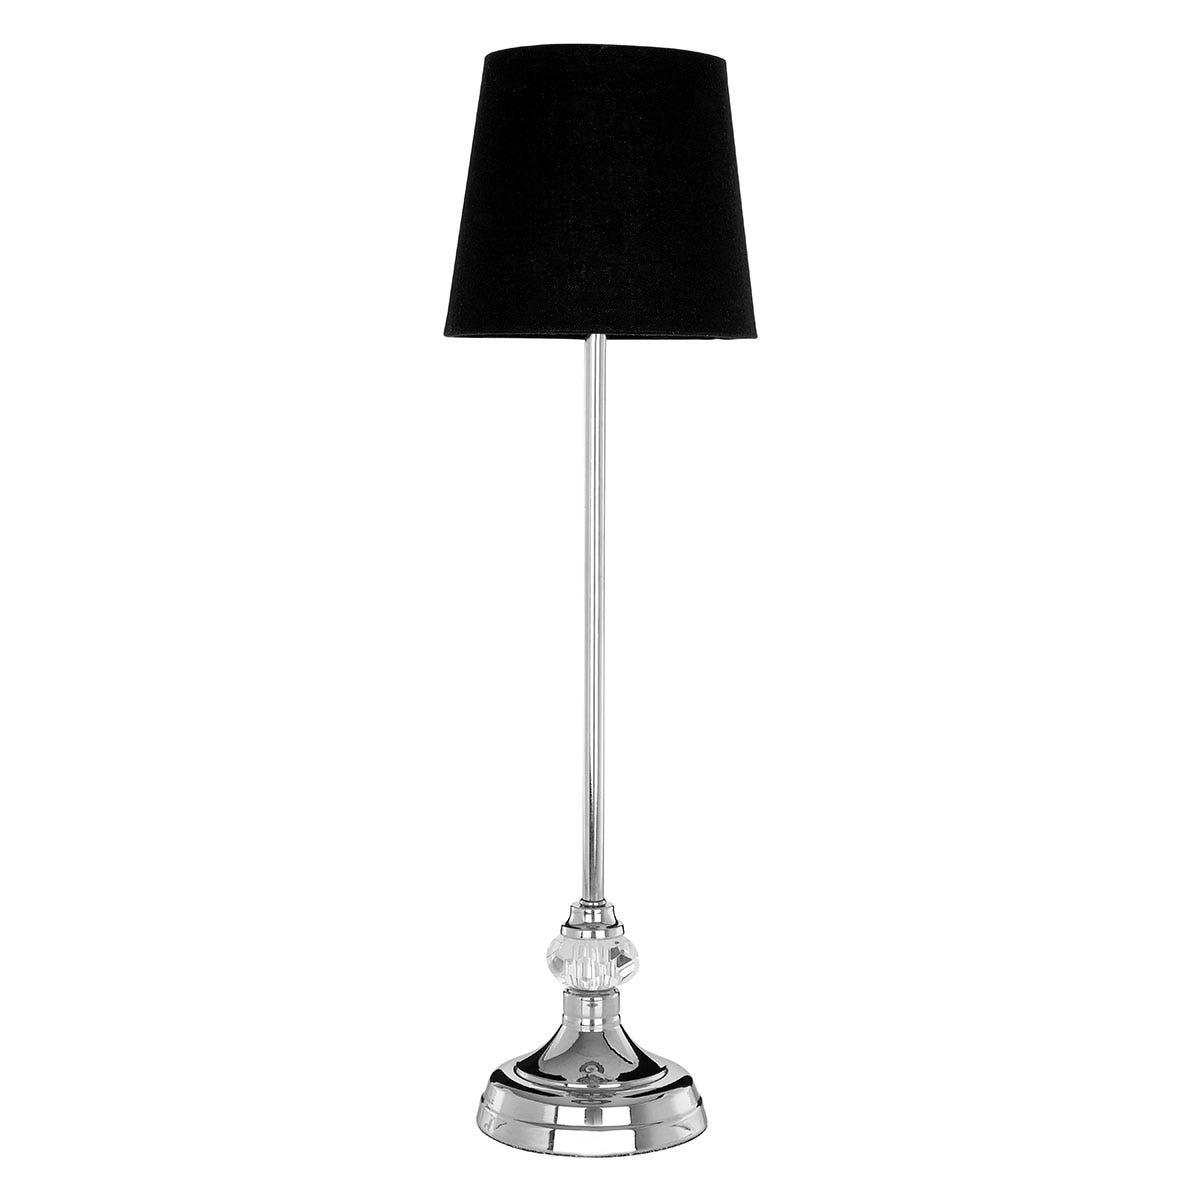 Premier Housewares Ursa Table Lamp with Black Shade